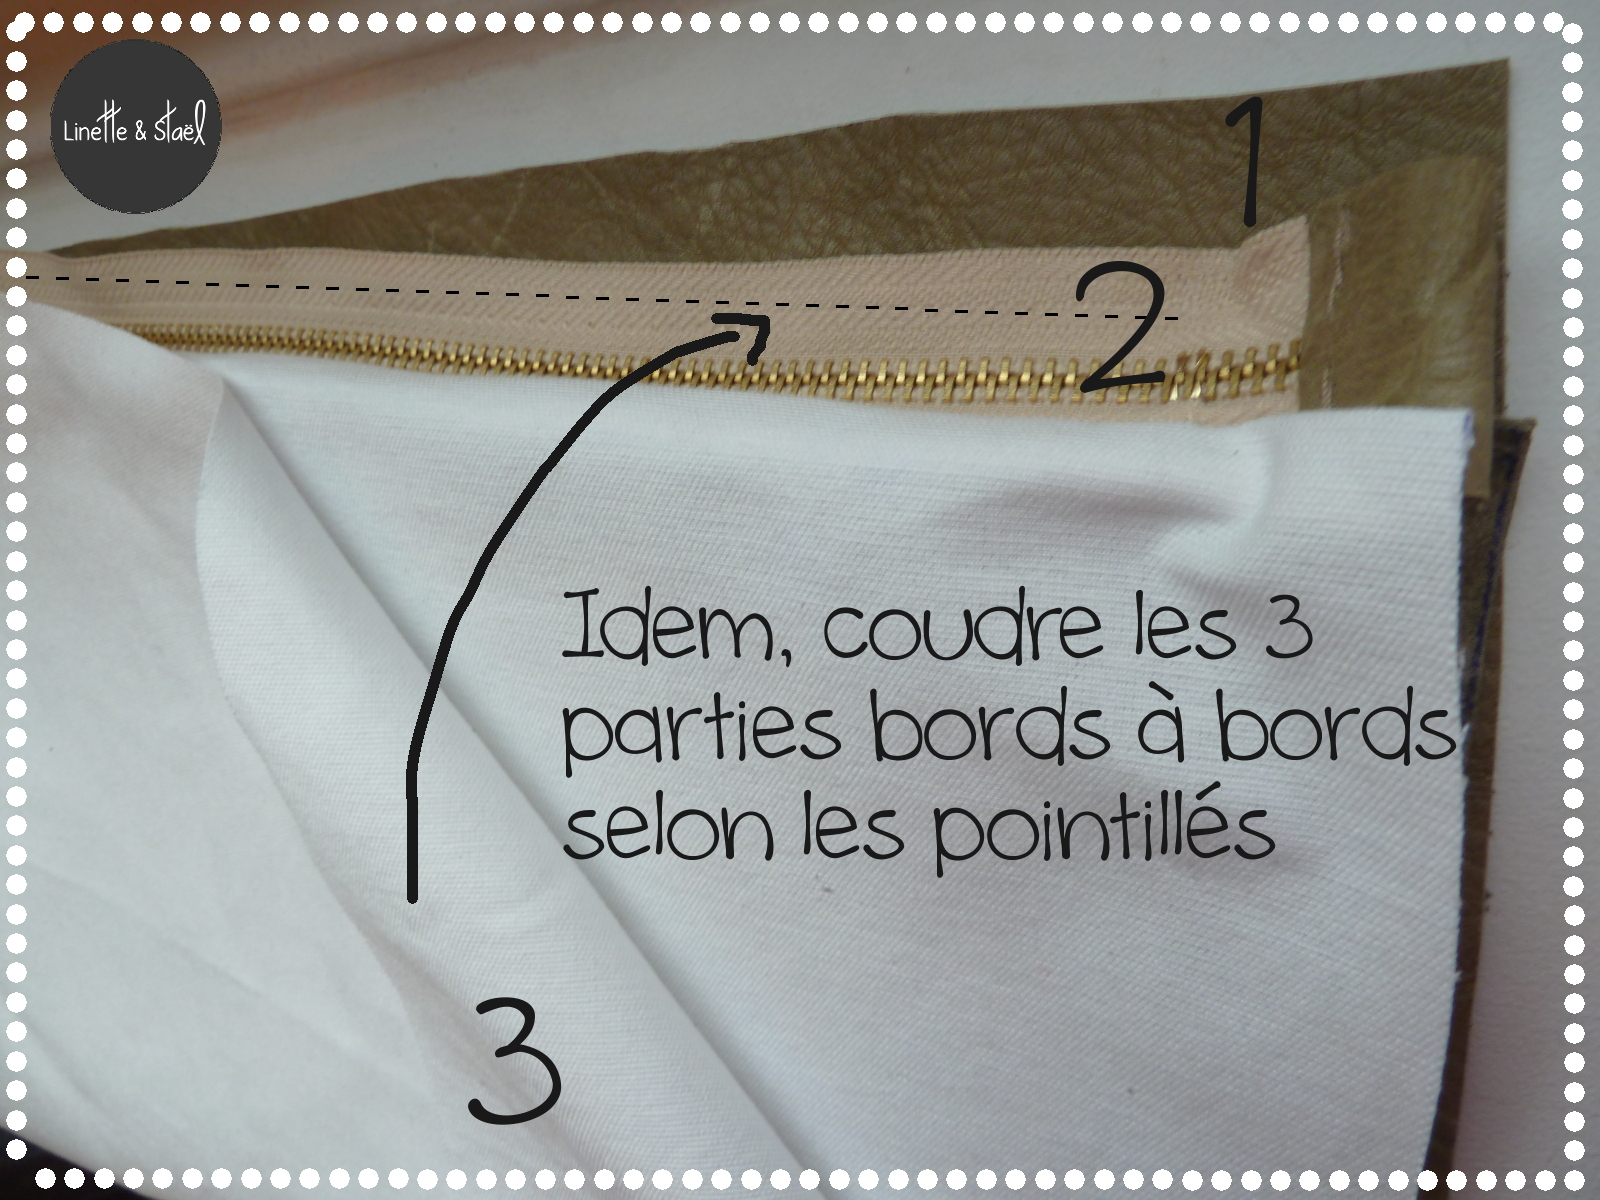 Couture Doublure Rideaux